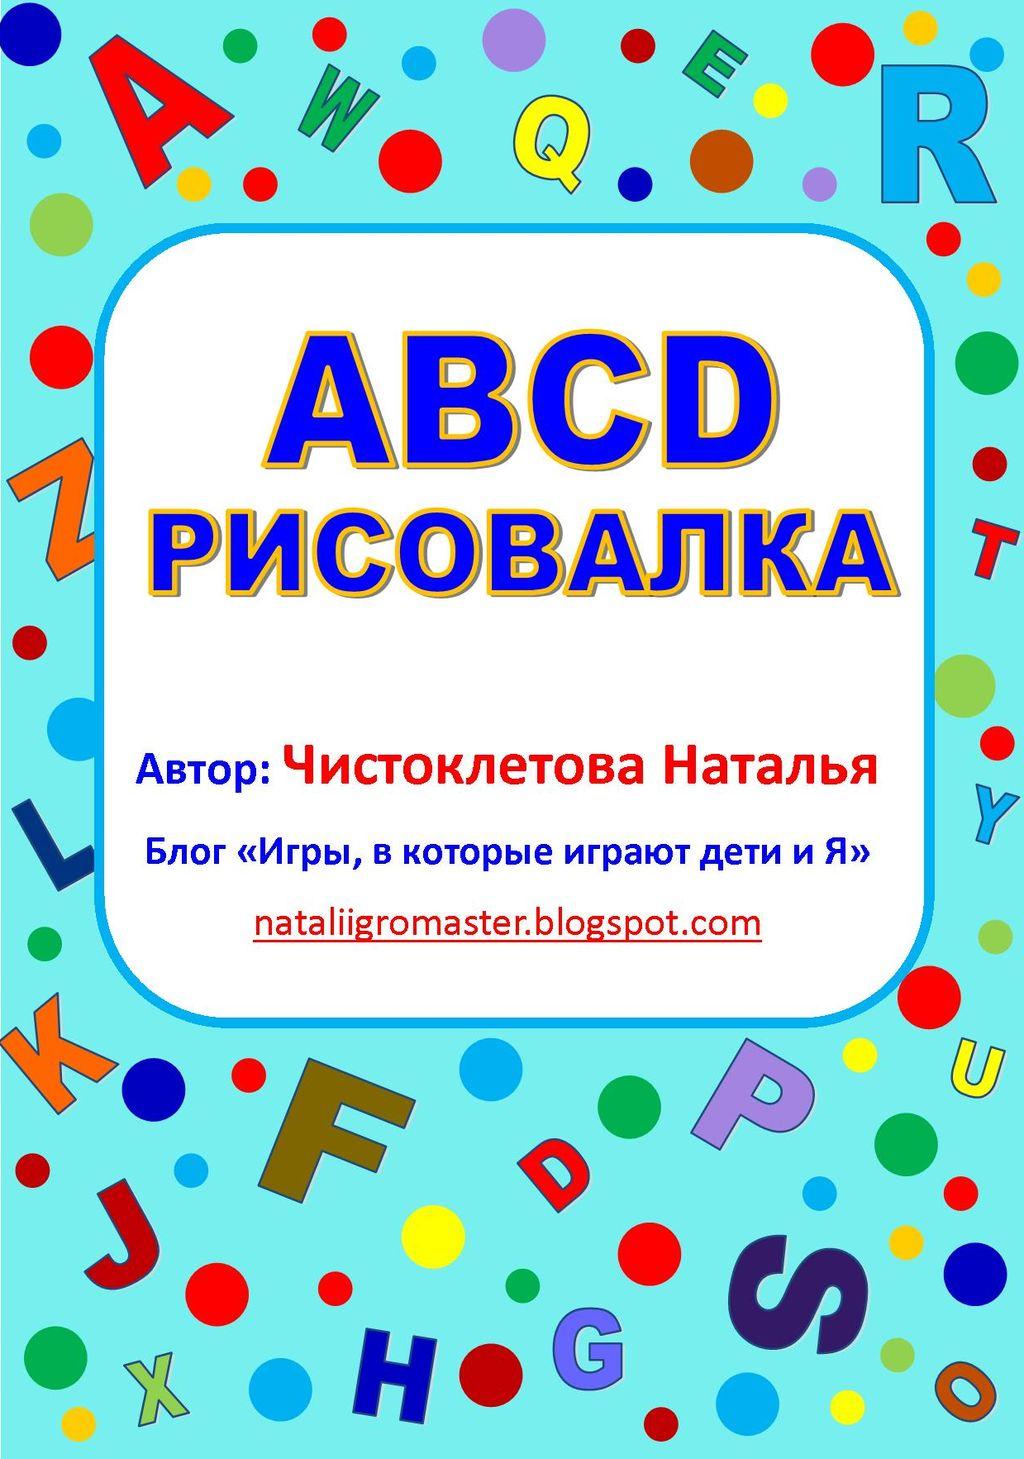 ABCD-рисовалка_обложка_nataliigromaster.jpg